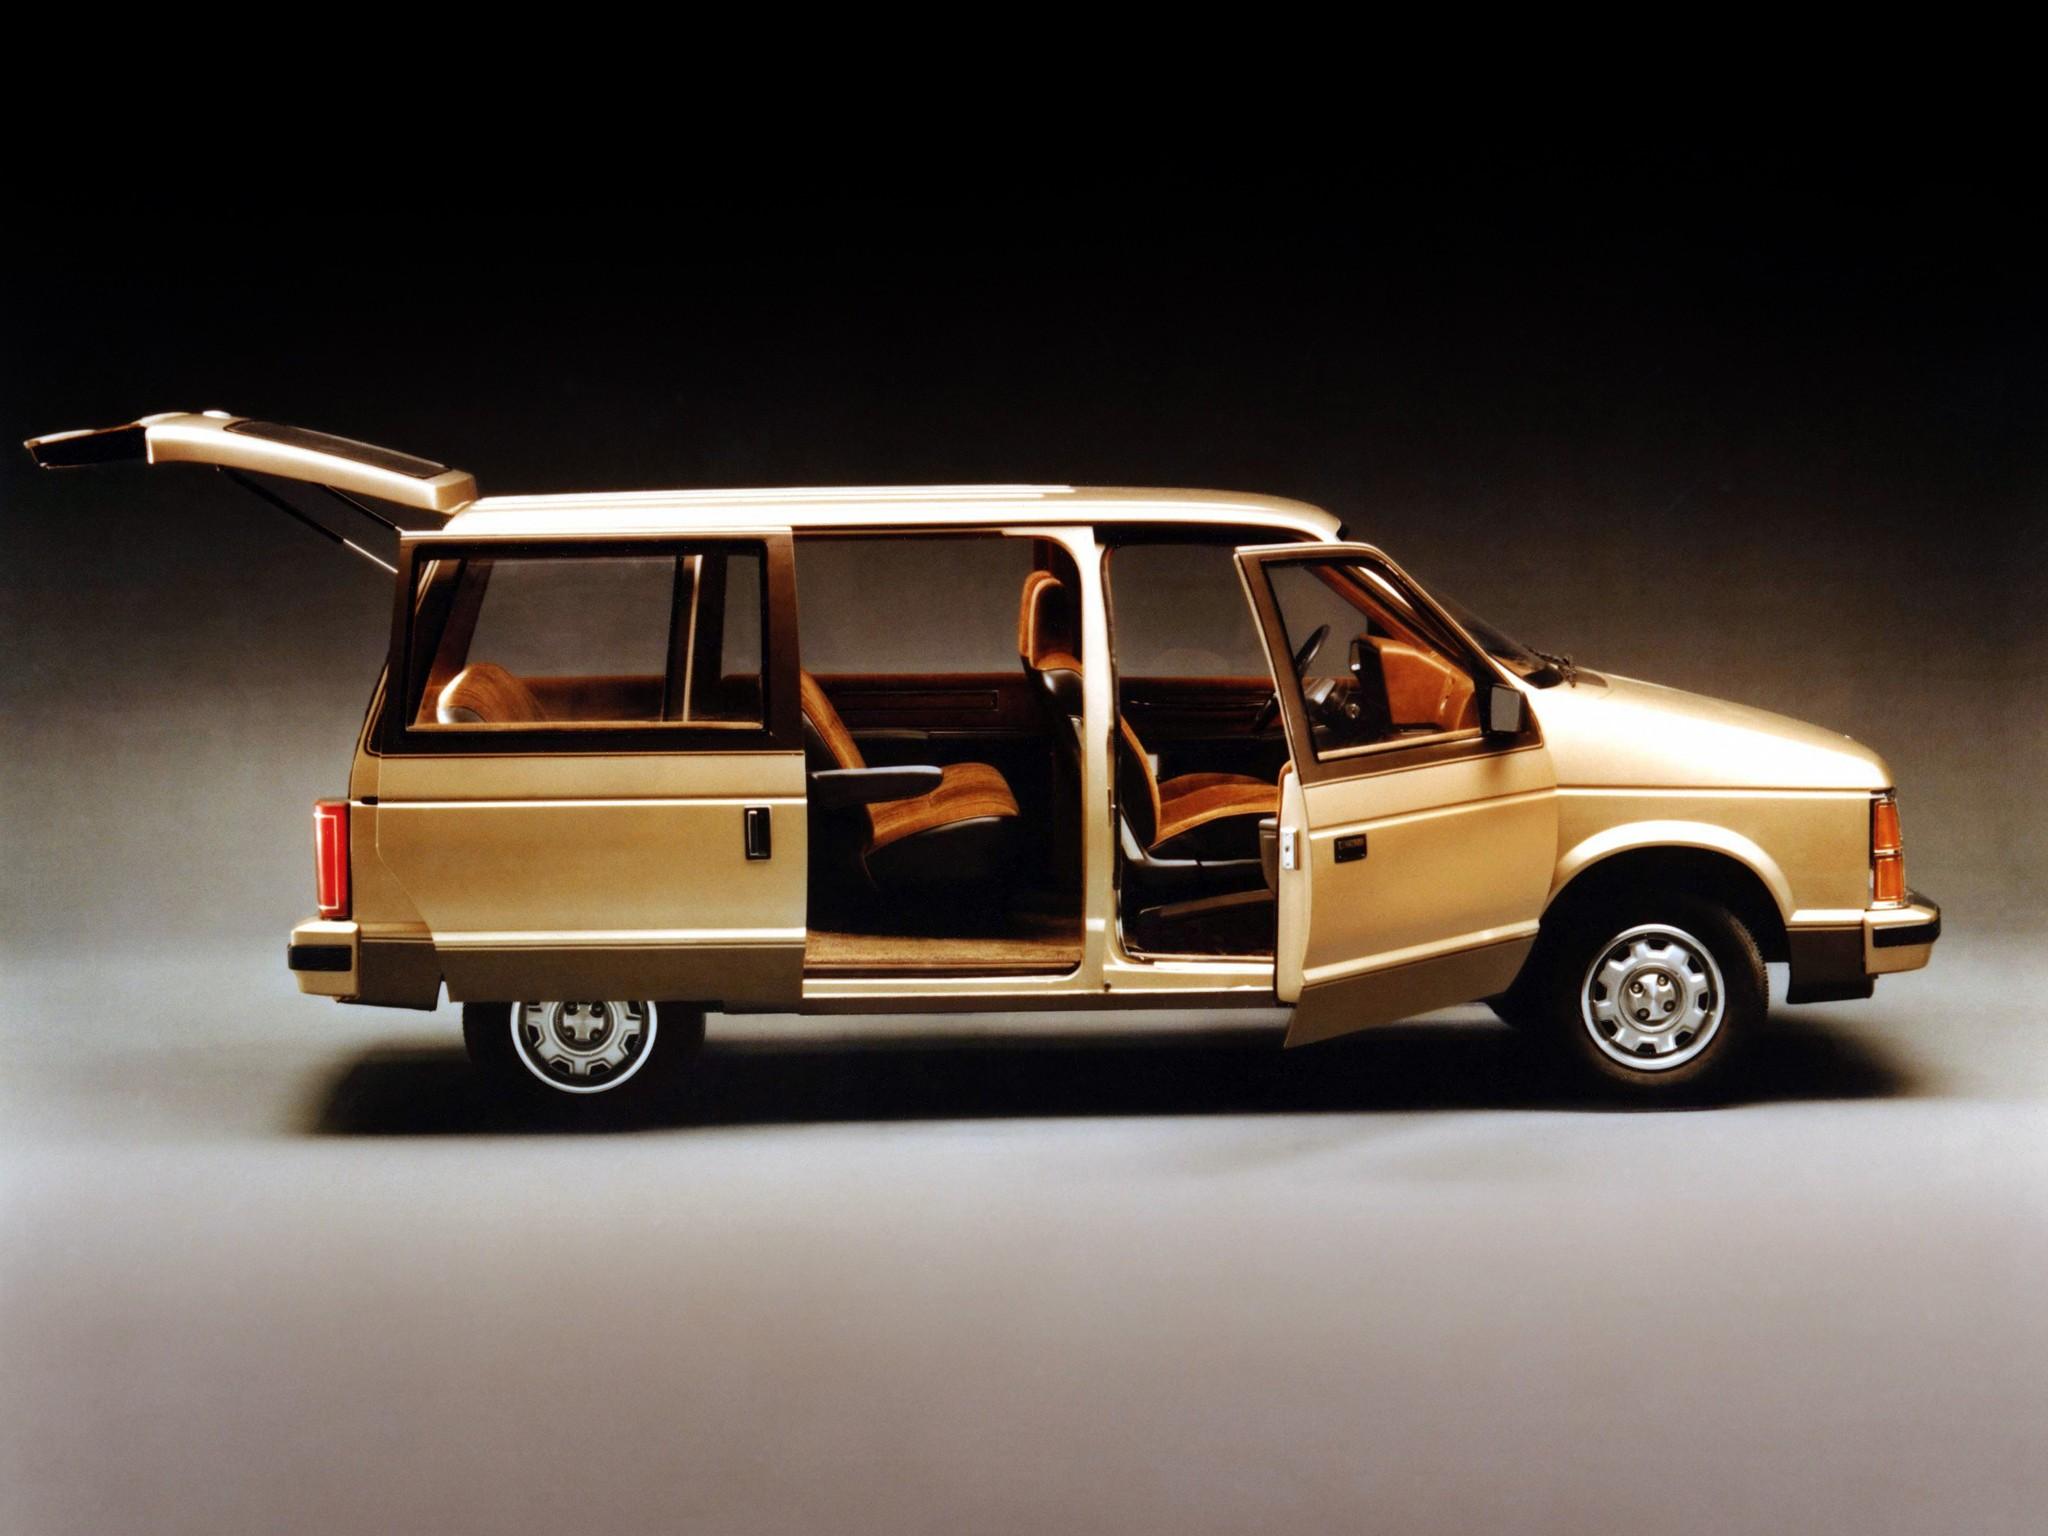 Dodge Caravan Specs Photos 1983 1984 1985 1986 1987 1988 1989 1990 Autoevolution